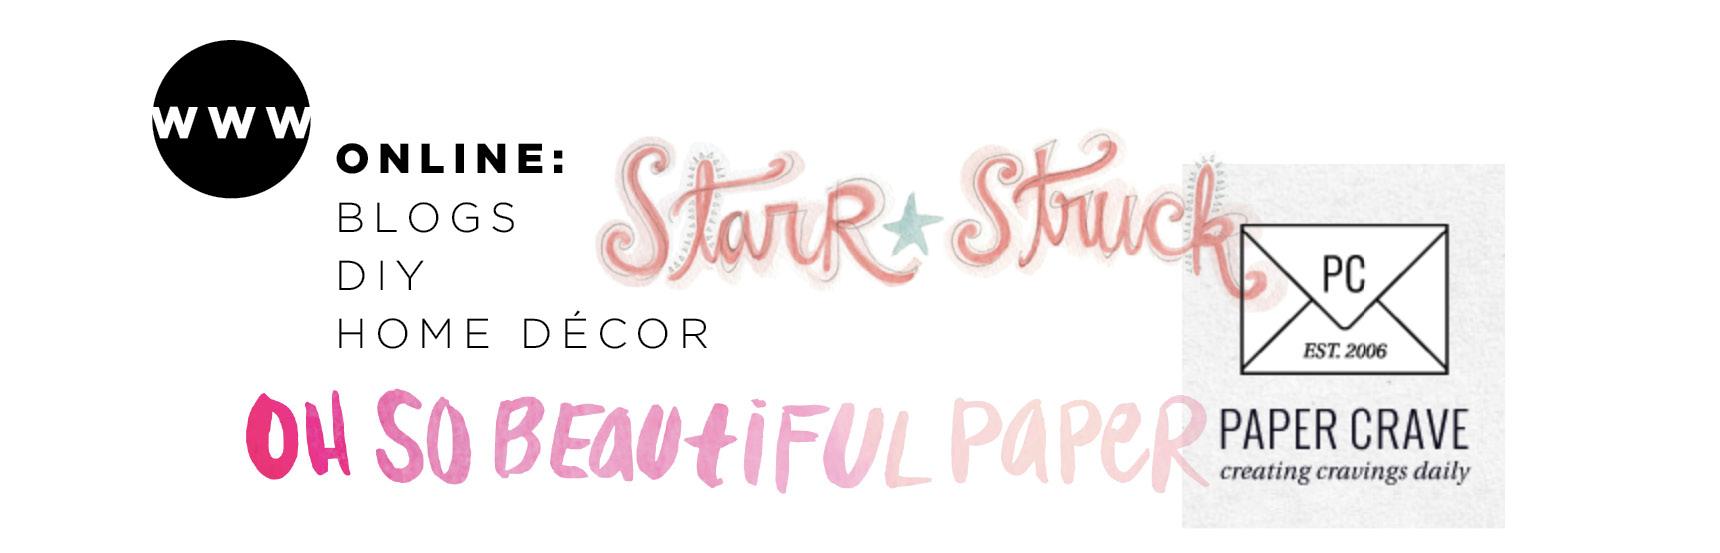 Inspiration online graphic